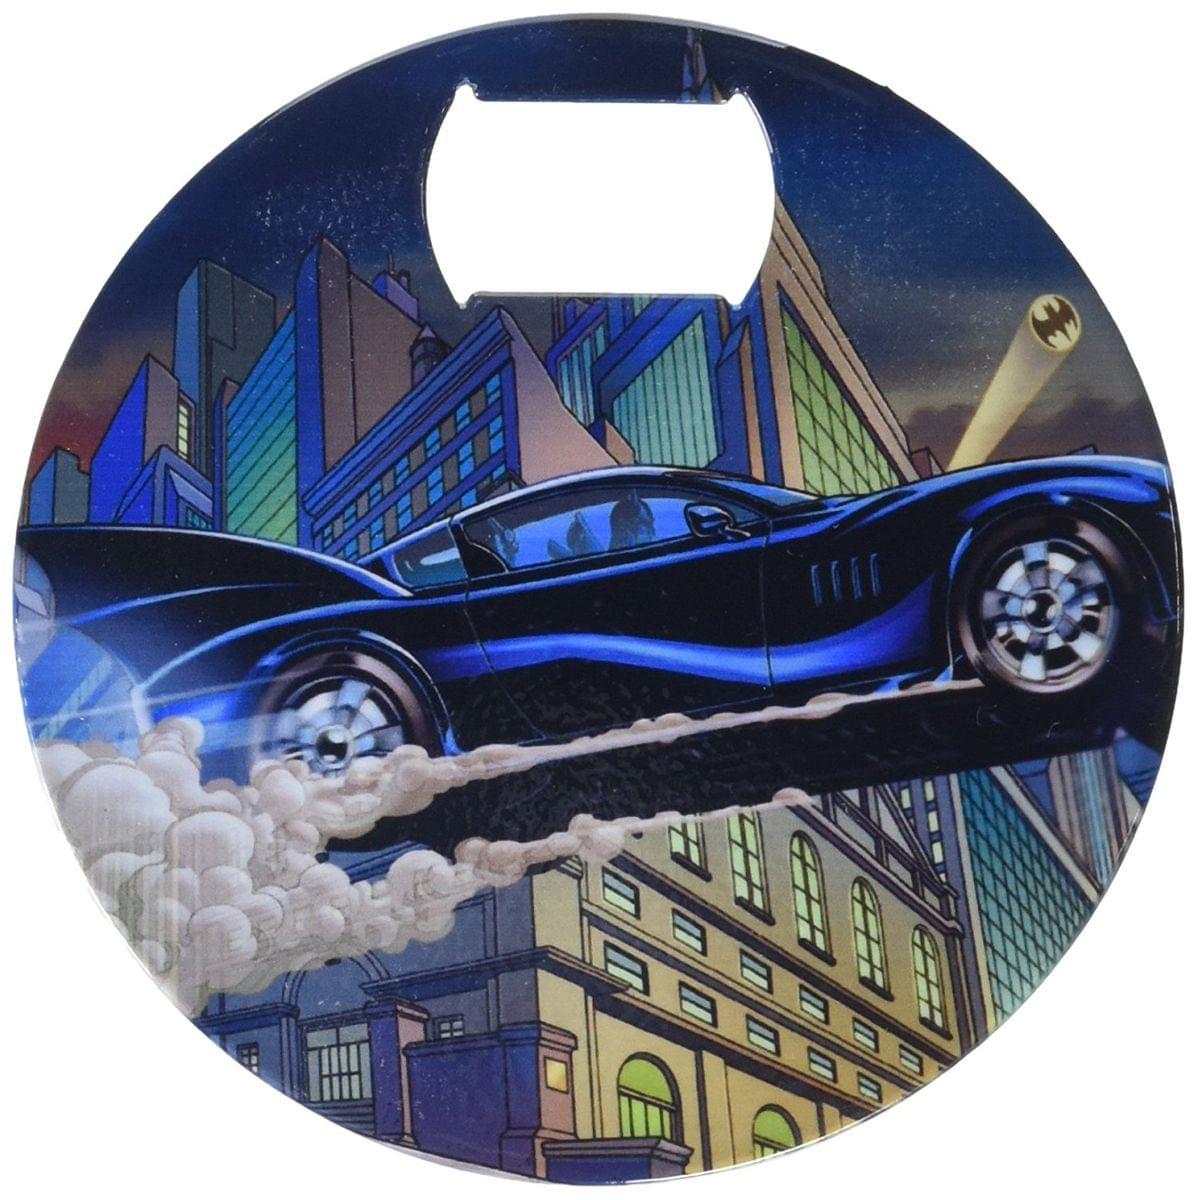 DC Comics Batman Batmobile Coaster Bottle Opener